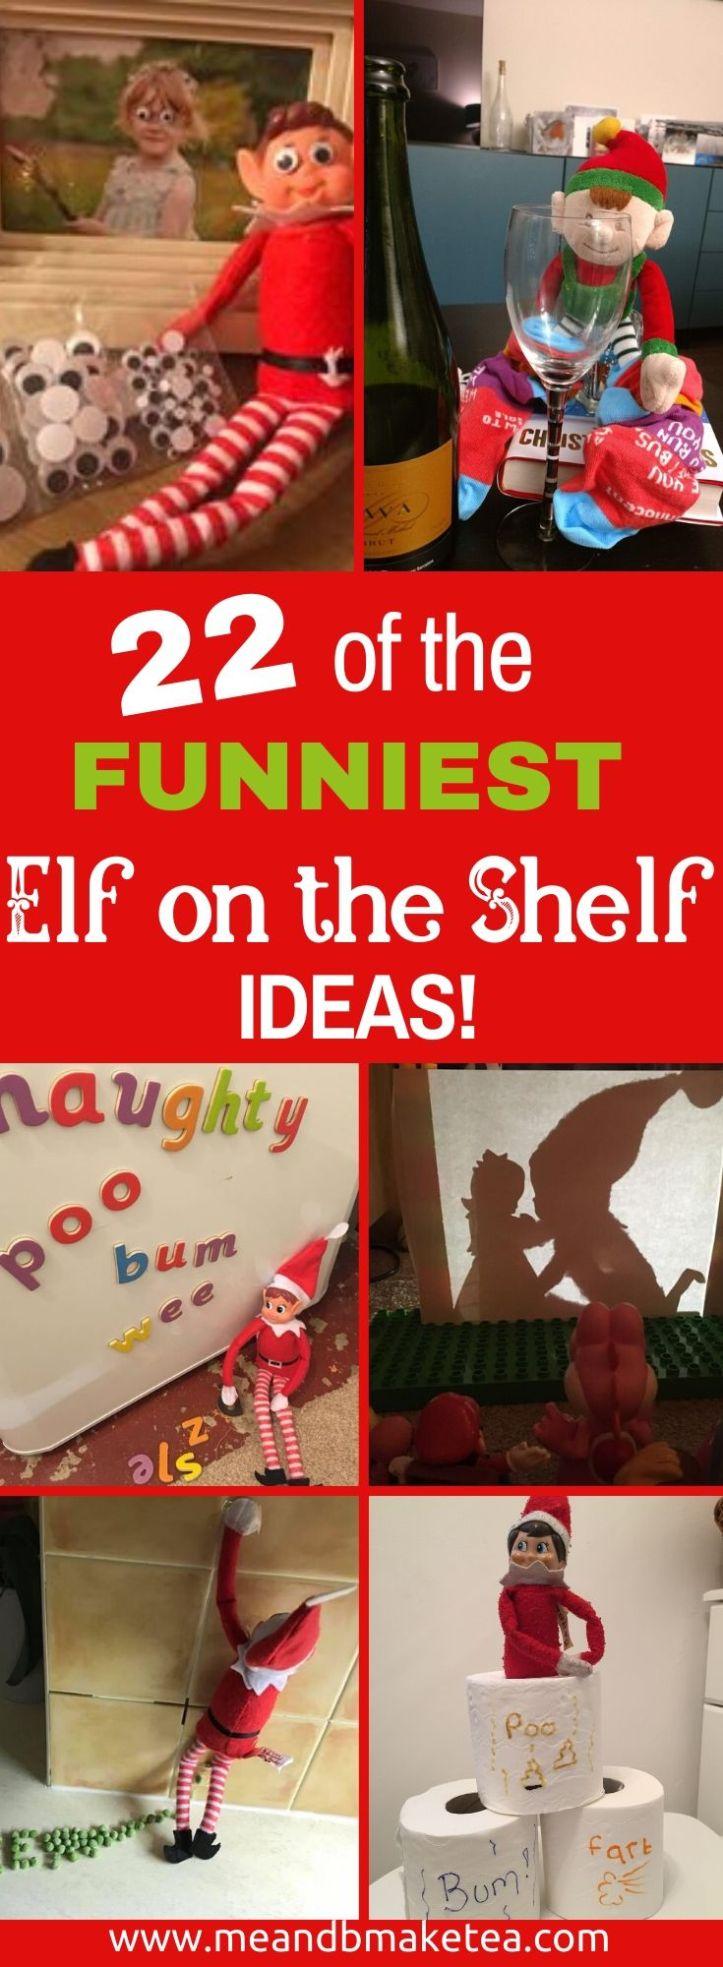 elf on the shelf tricks